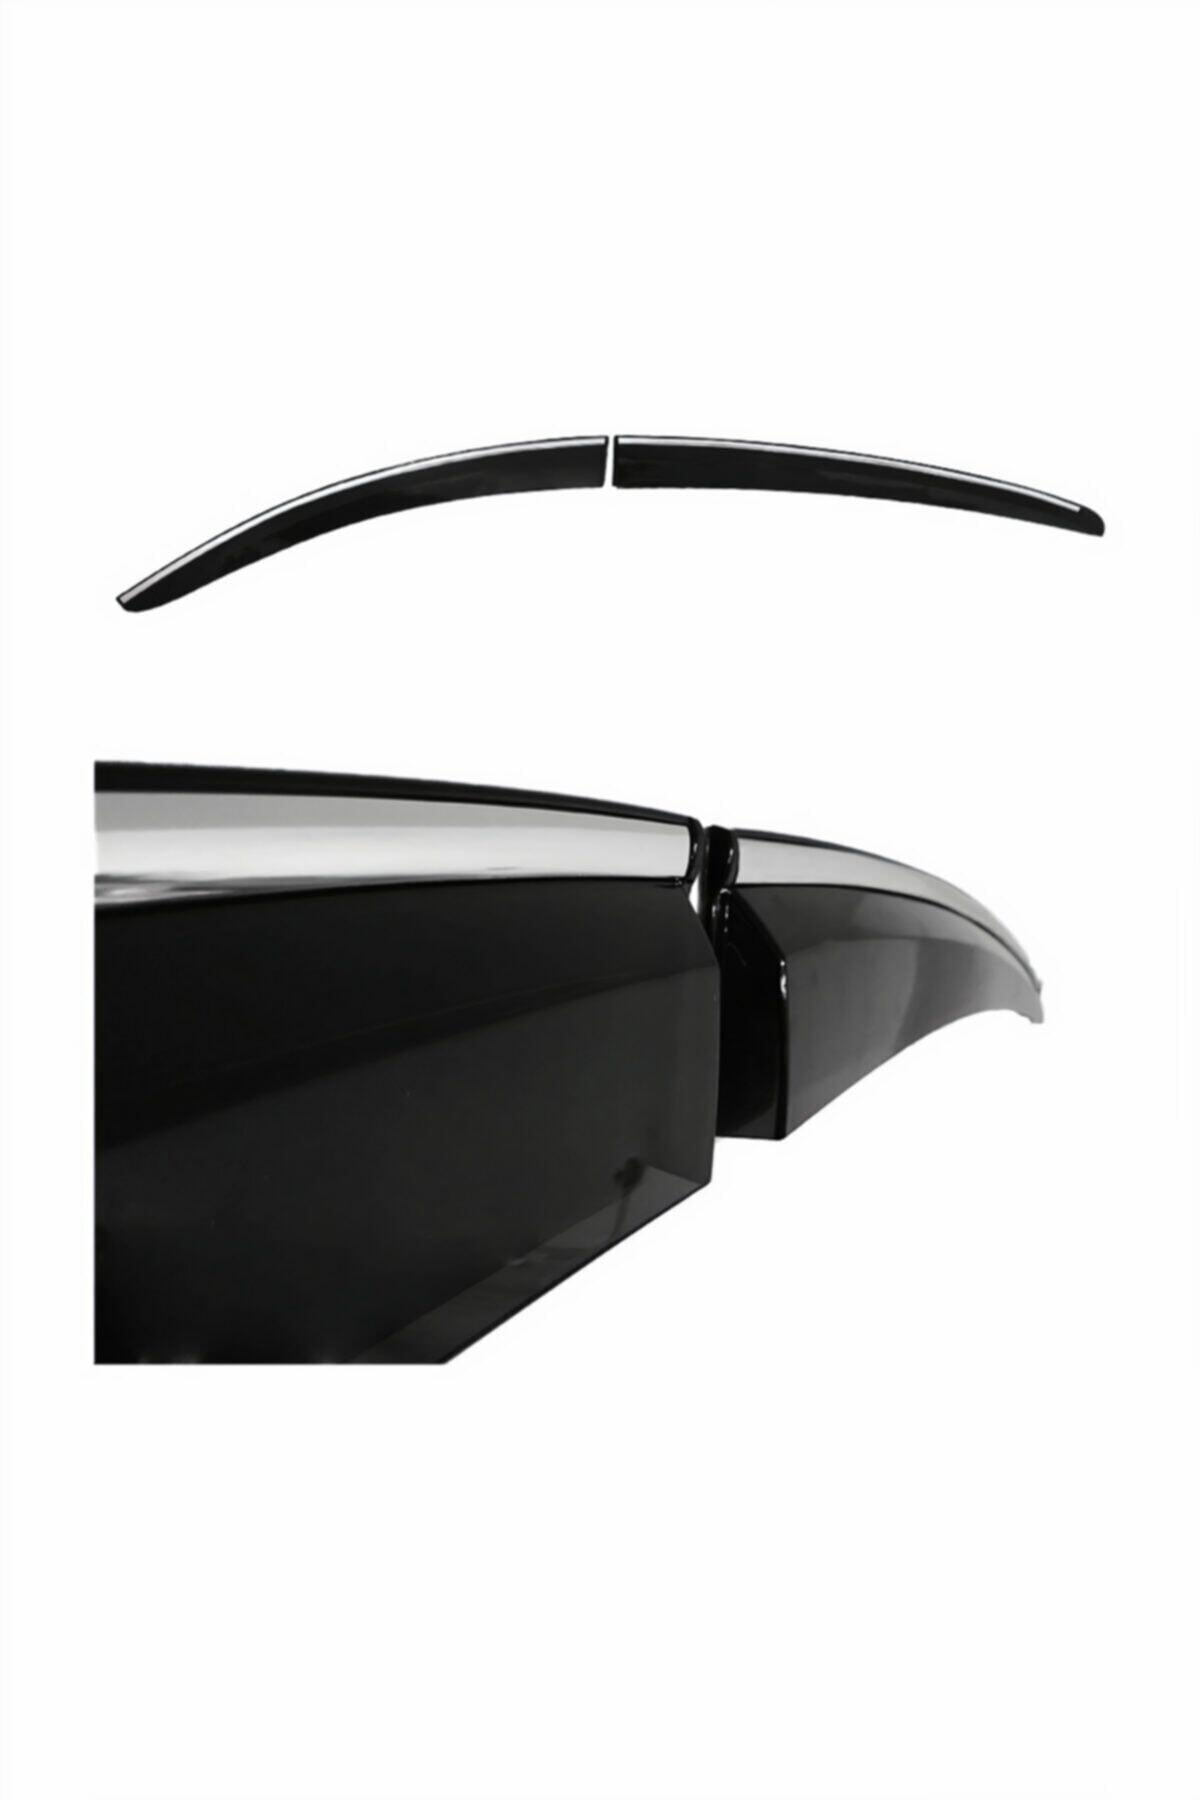 Golf 4 Chrome Stripe Glass Spoiler